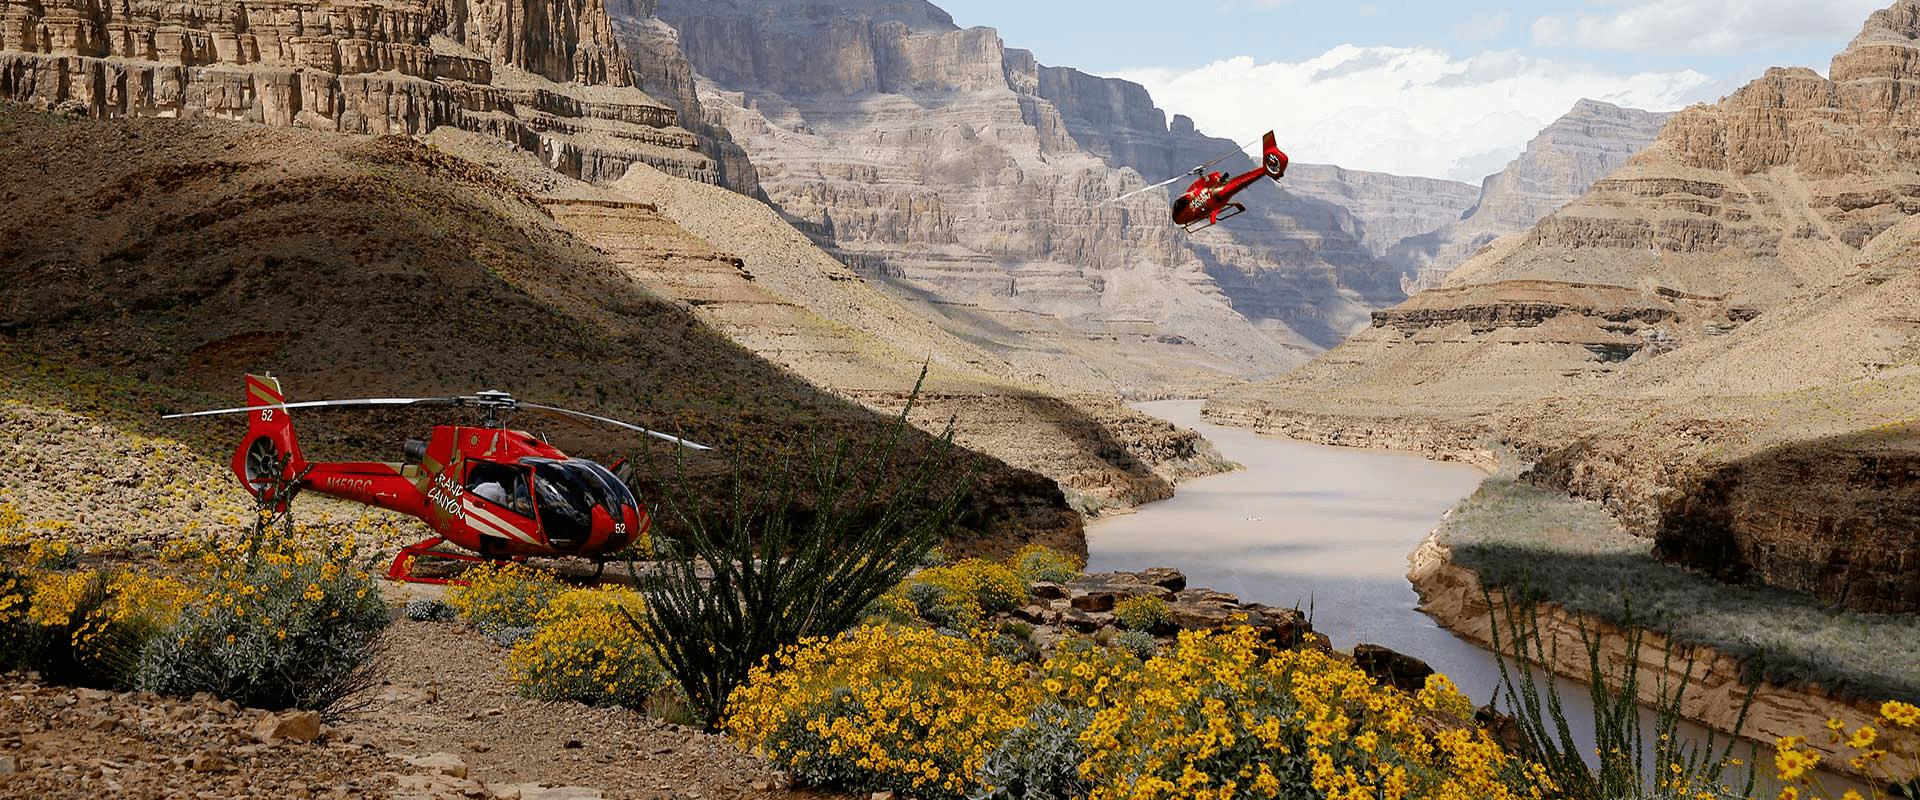 Полет на вертолете над Гранд-Каньоном